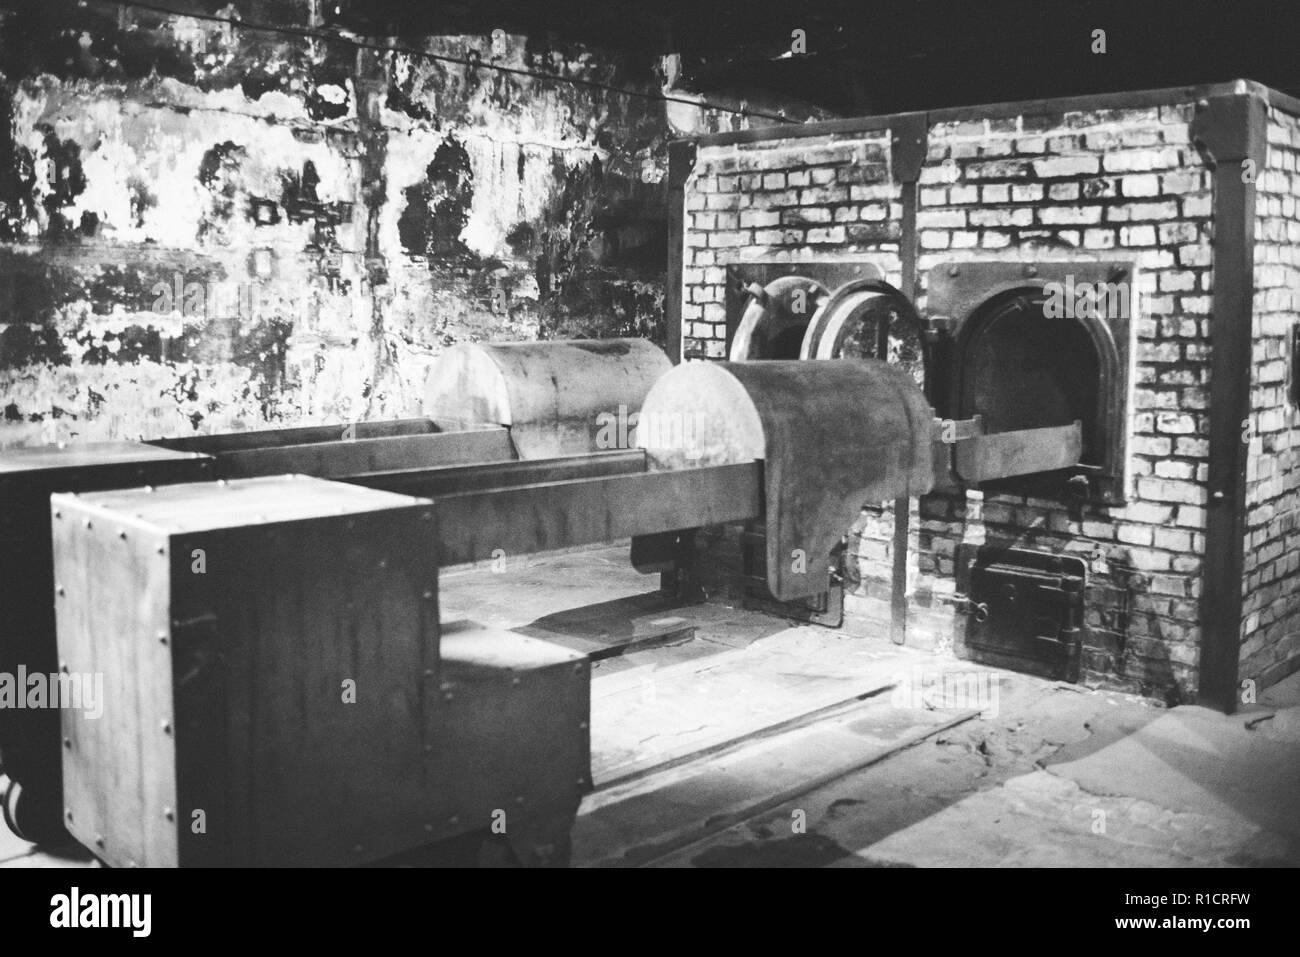 Auschwitz Nazi concentration and extermination camp. Crematory oven at Auschwitz. Auschwitz, German-occupied, Poland, Europe Stock Photo - Alamy